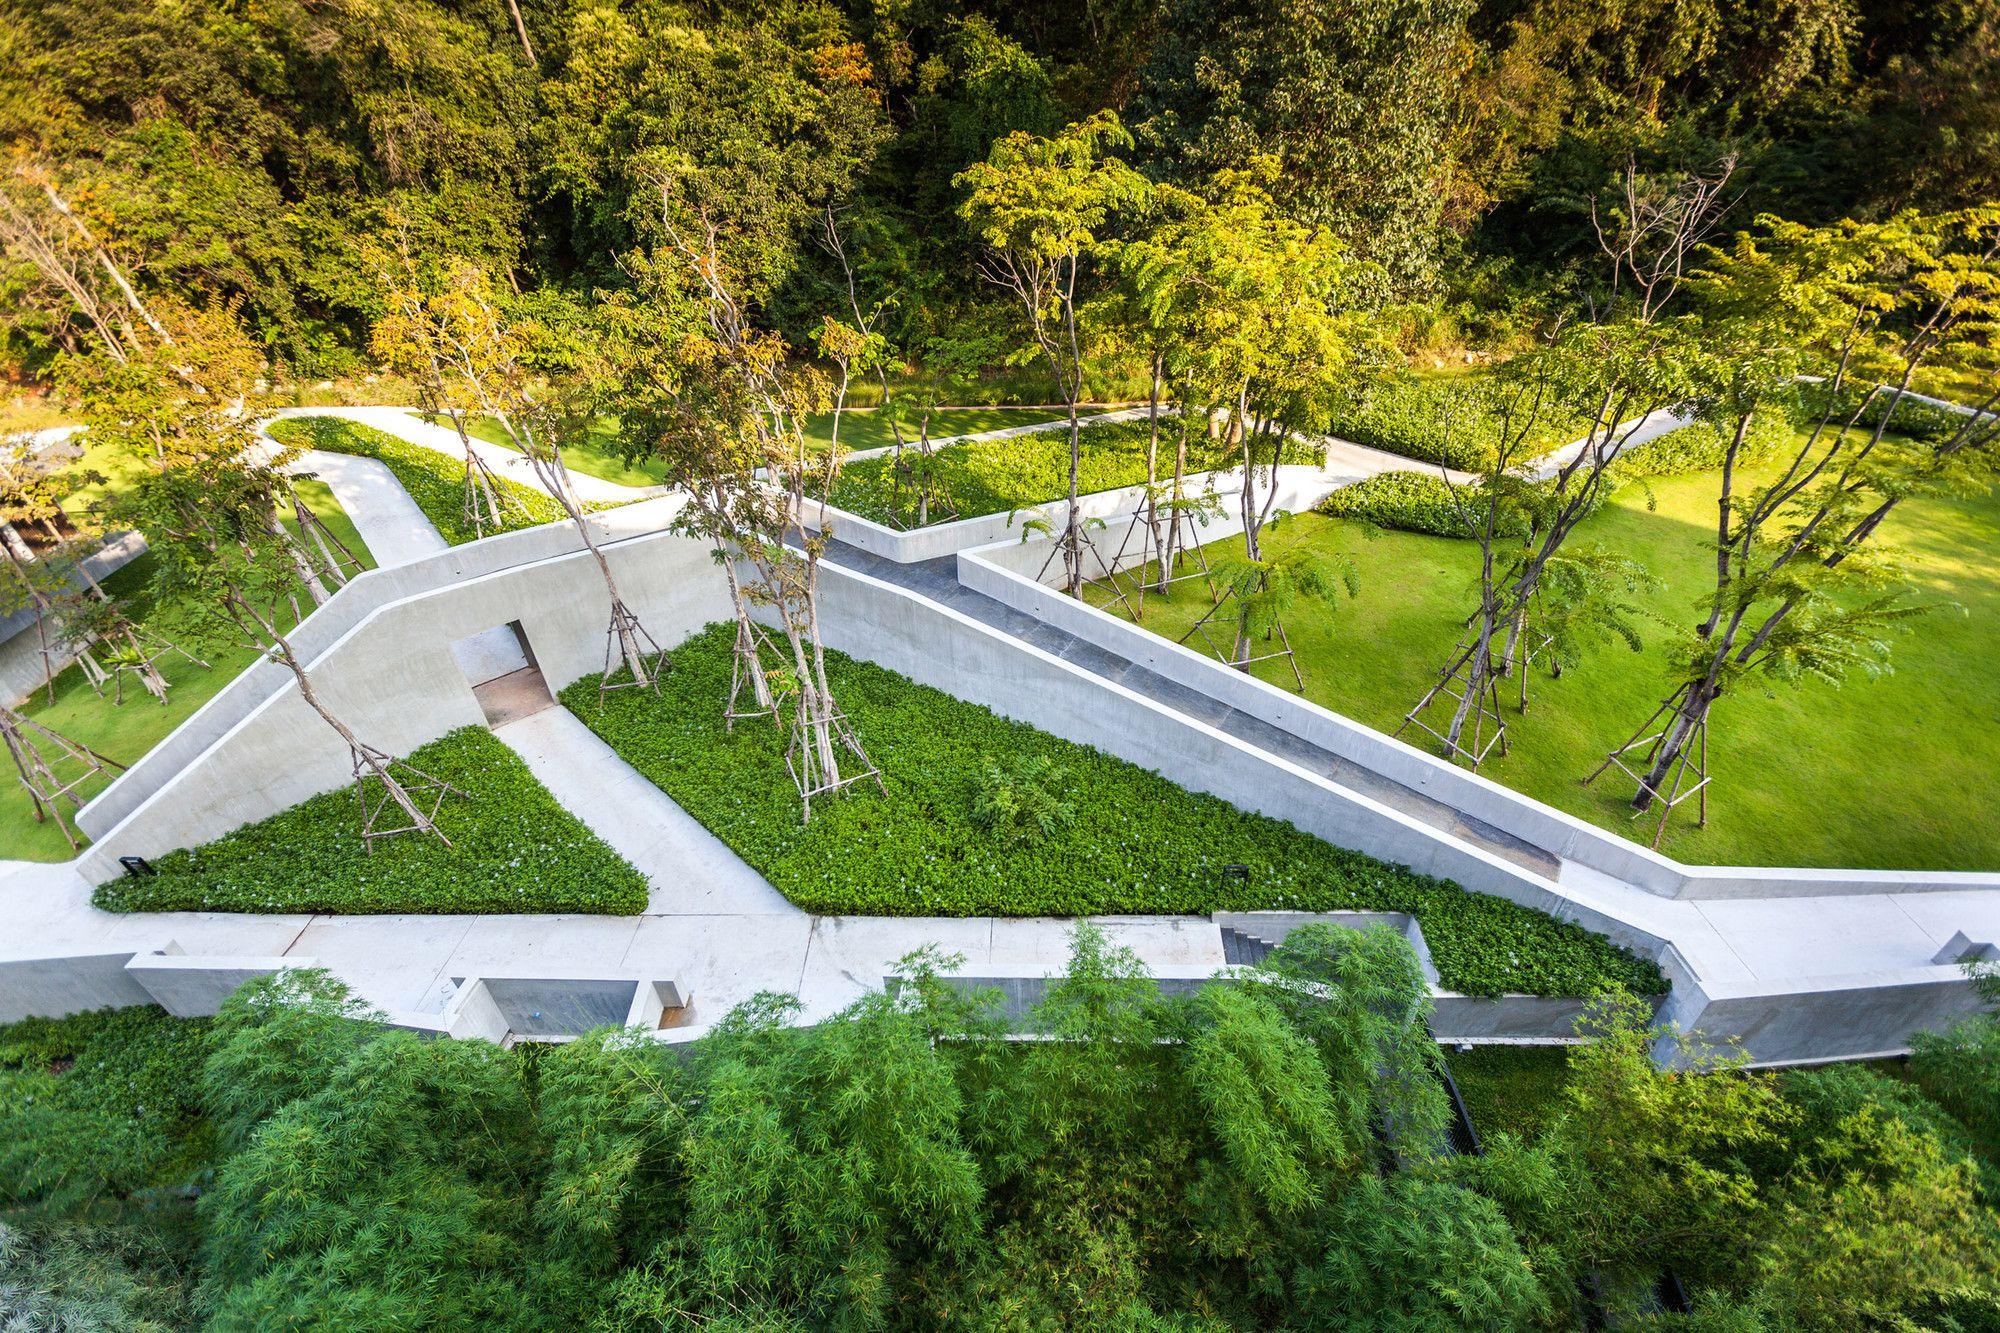 Gallery Of Botanica Khao Yai Vin Varavarn Architects 28 Urban Landscape Design Landscape Architect Landscape Design